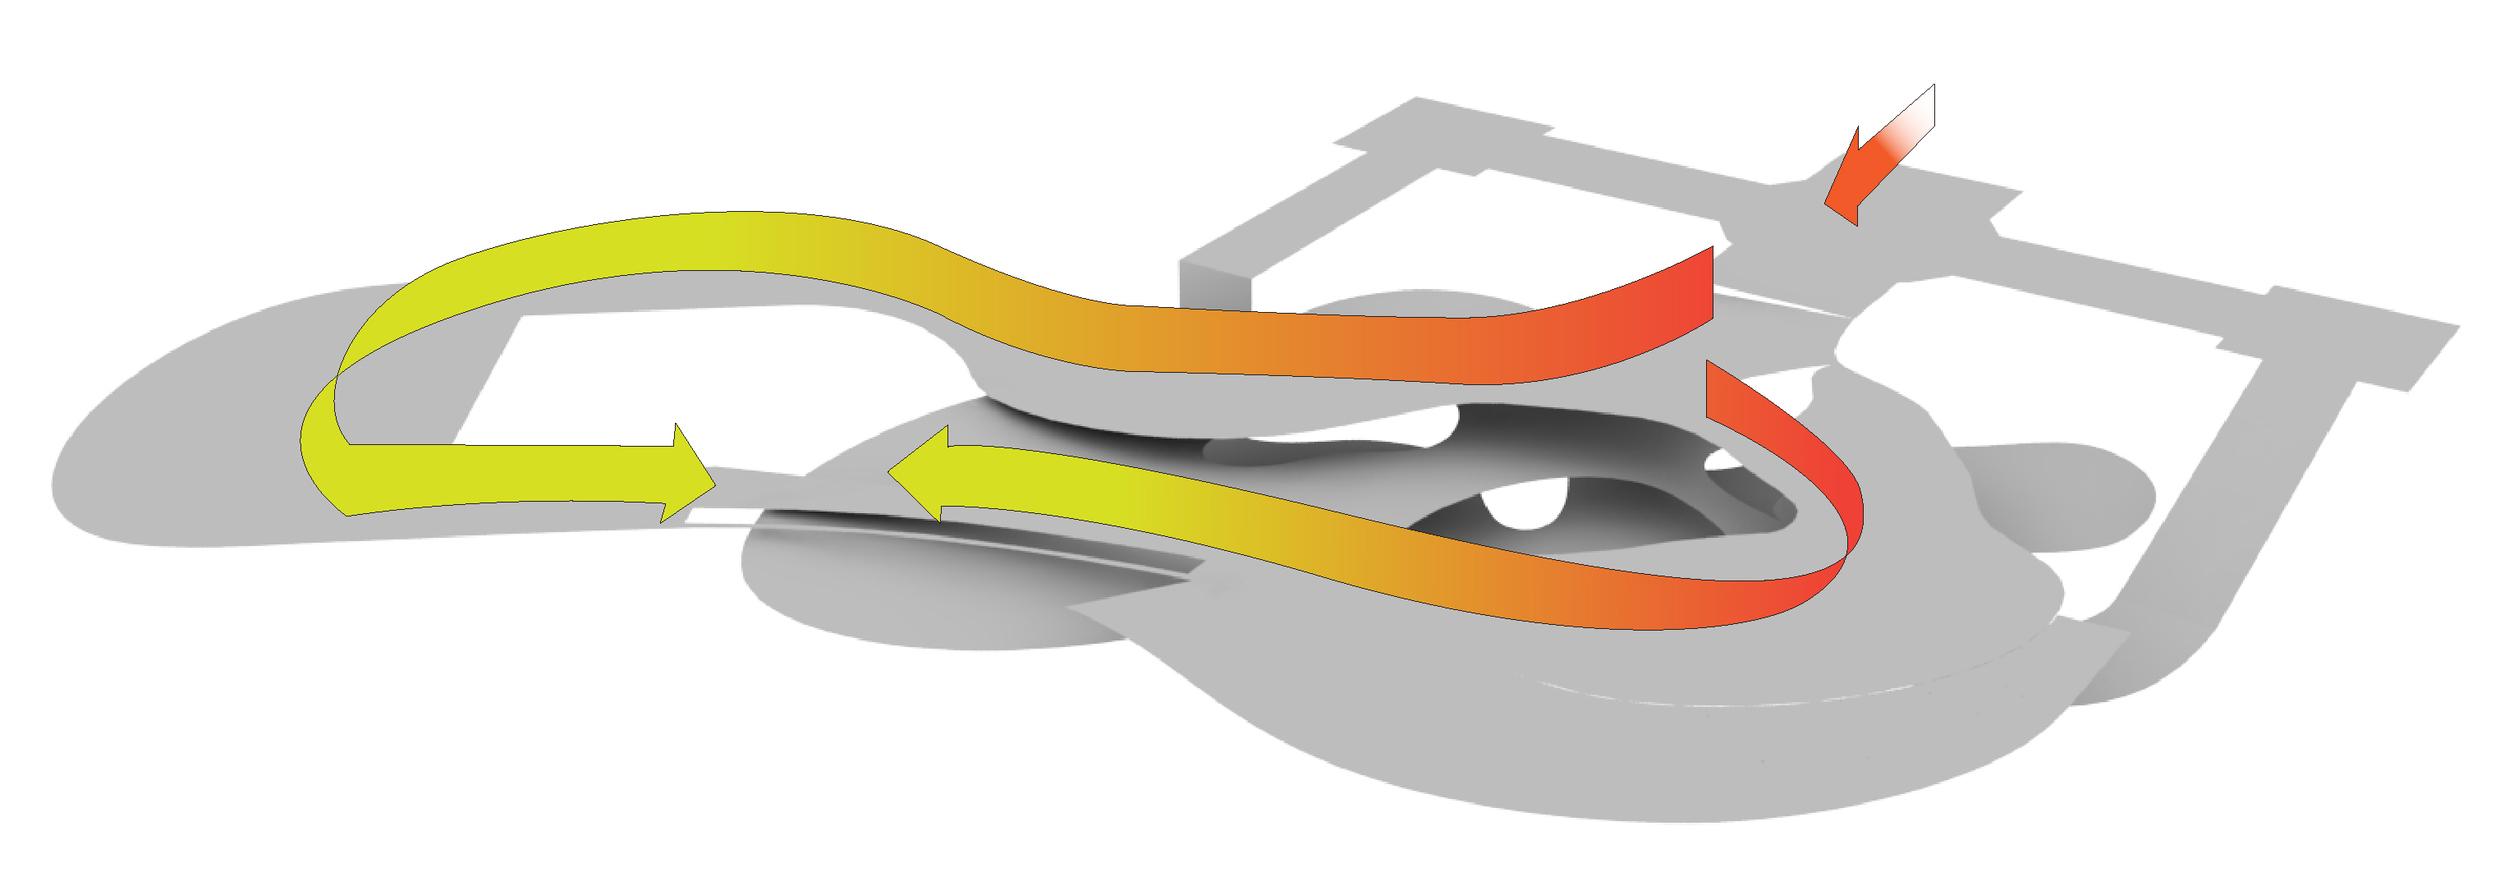 circulation 1.jpg